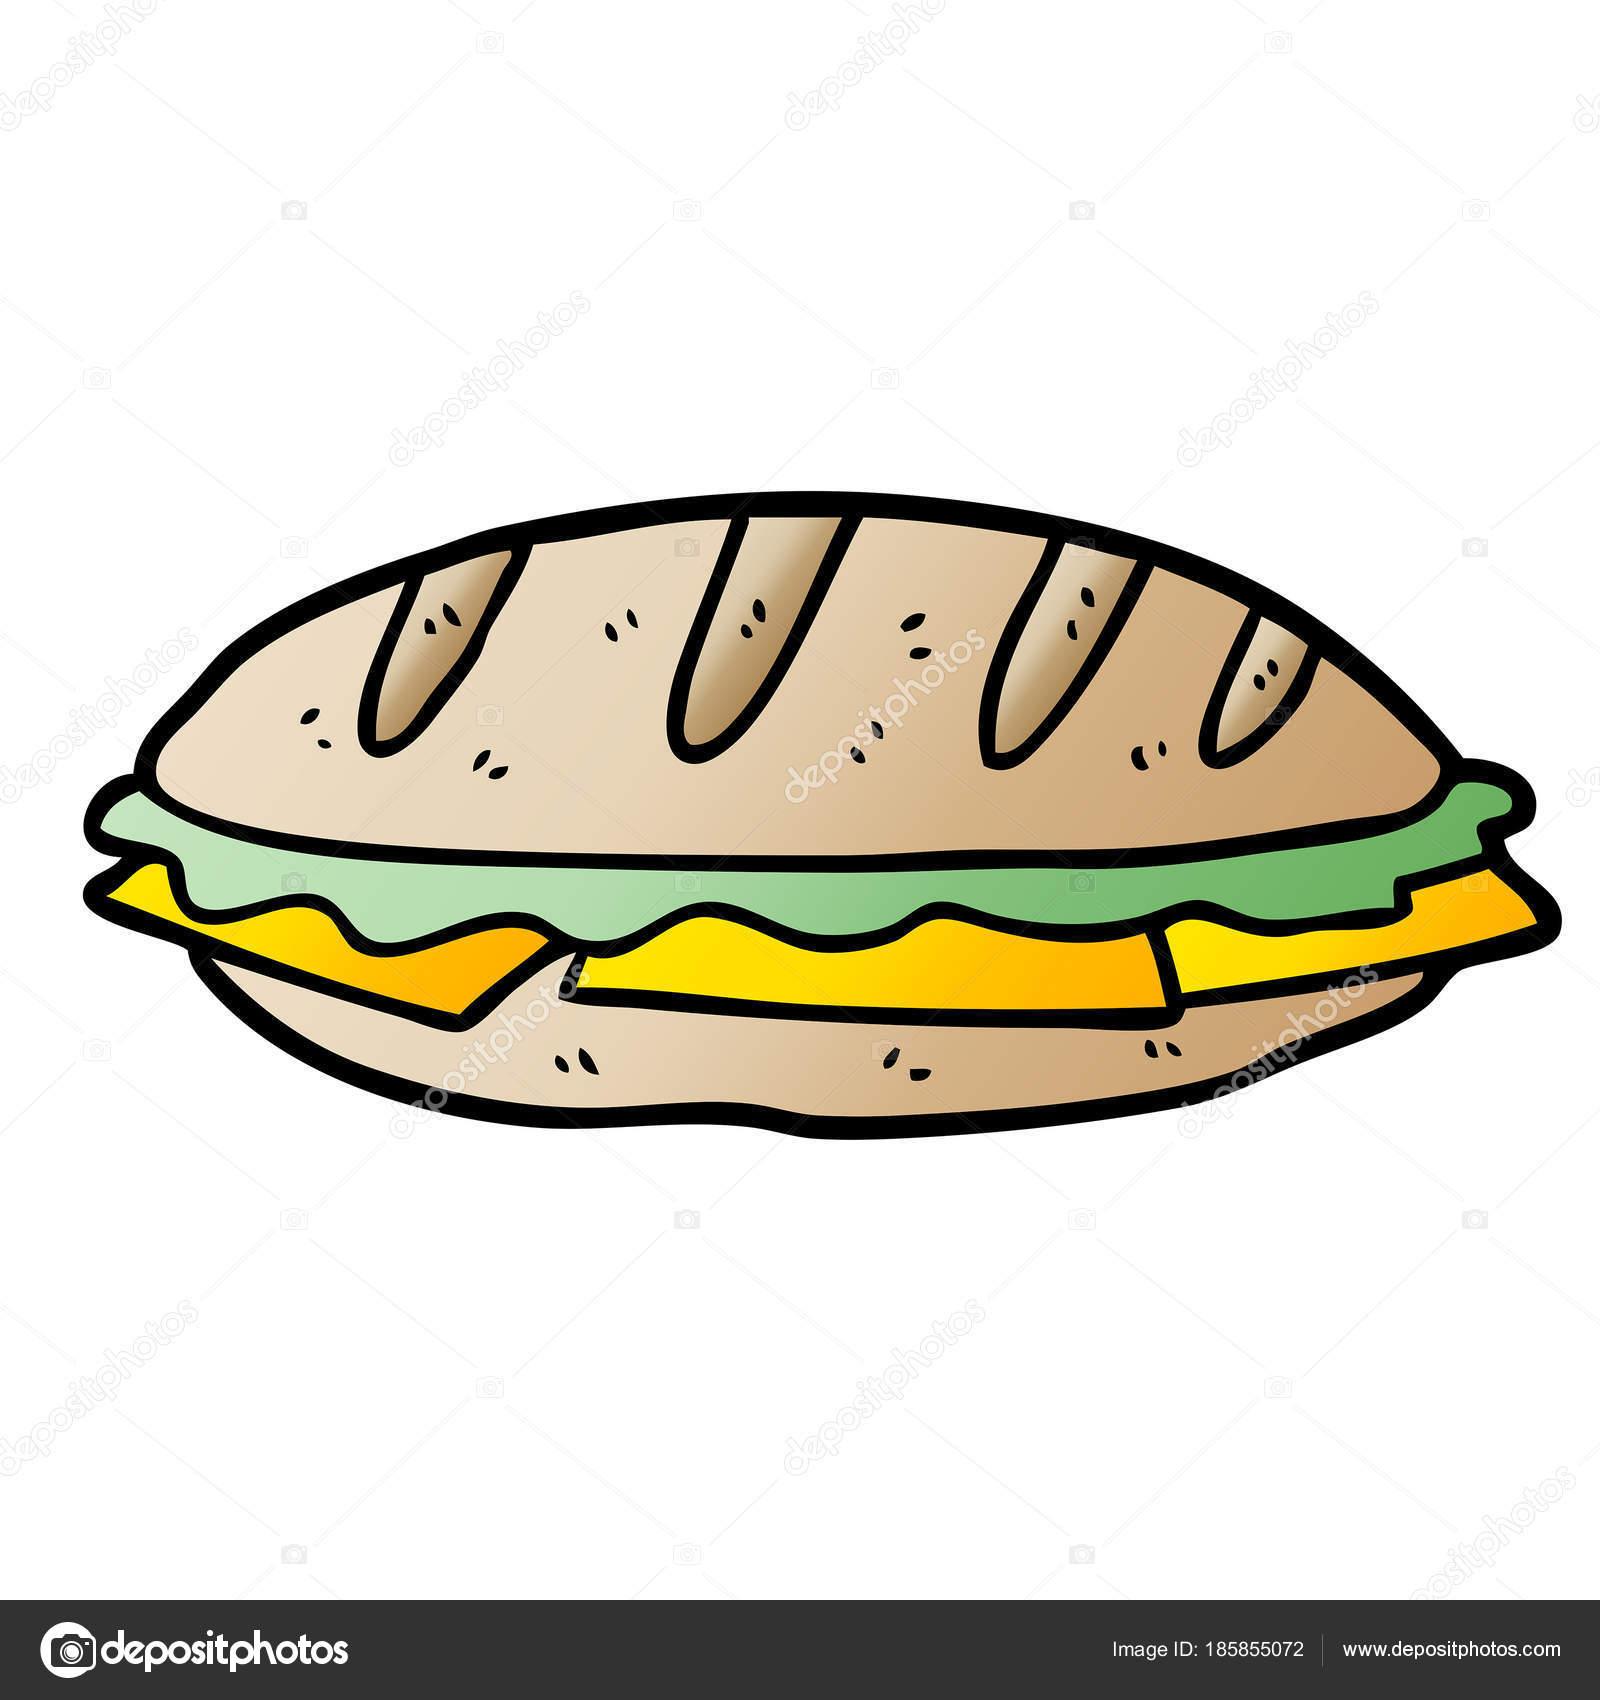 vector illustration sandwich cartoon character stock vector c lineartestpilot 185855072 vector illustration sandwich cartoon character stock vector c lineartestpilot 185855072